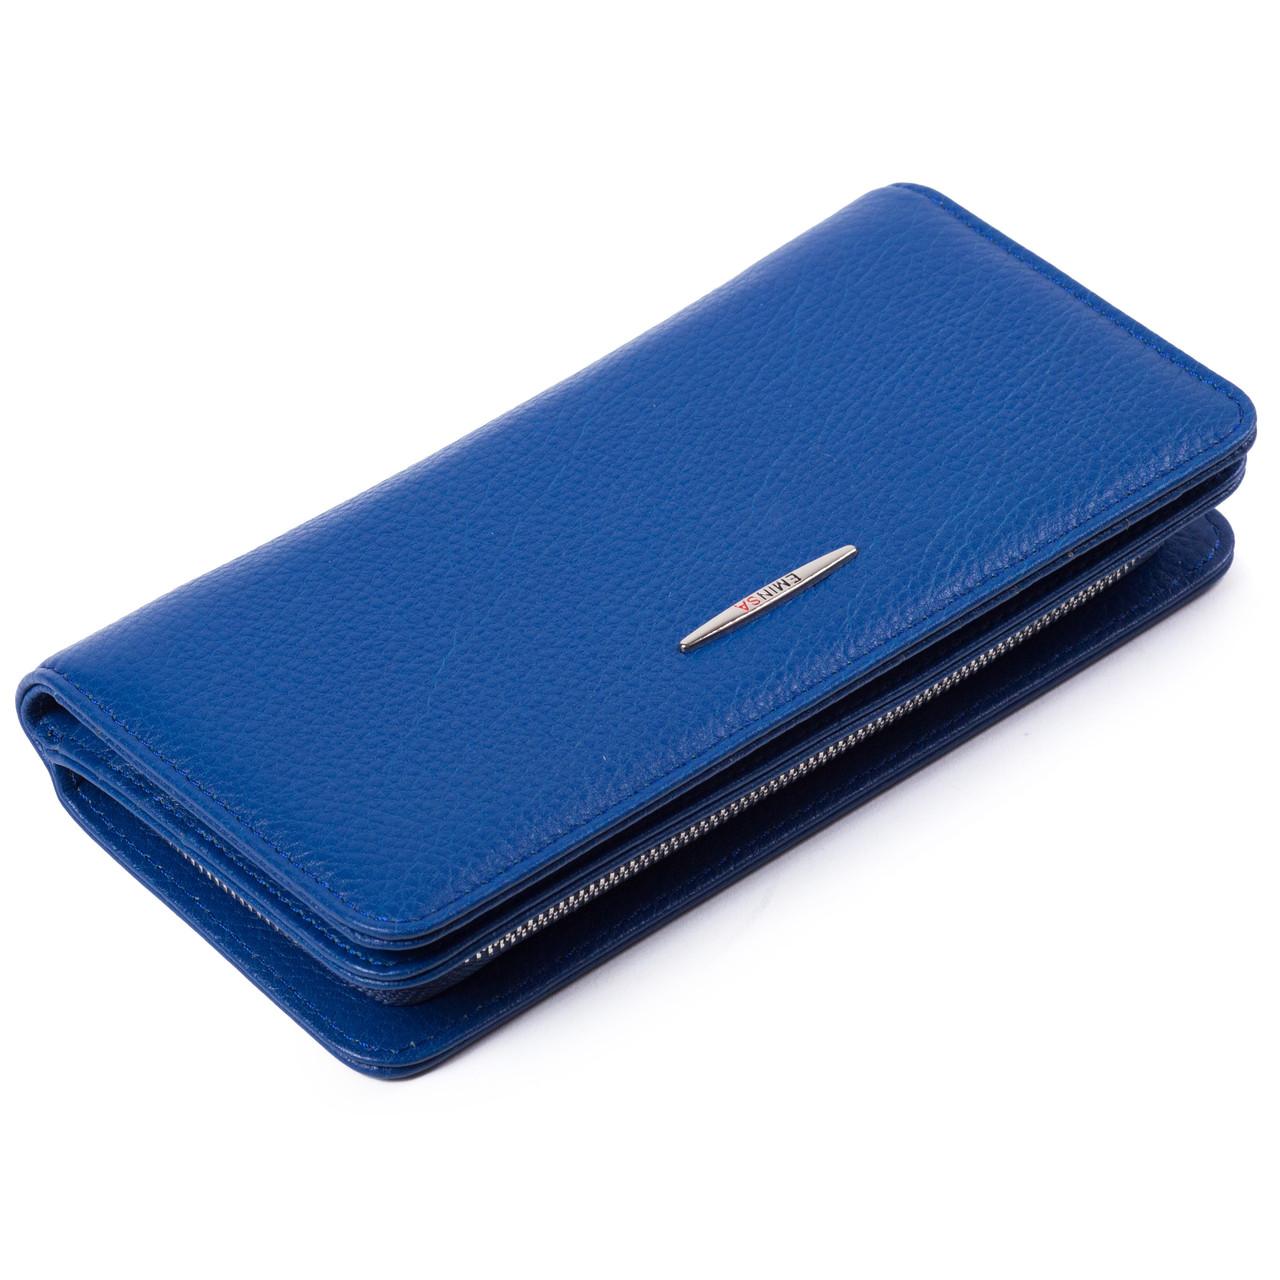 Женский кошелек кожаный синий Eminsa 2151-18-15